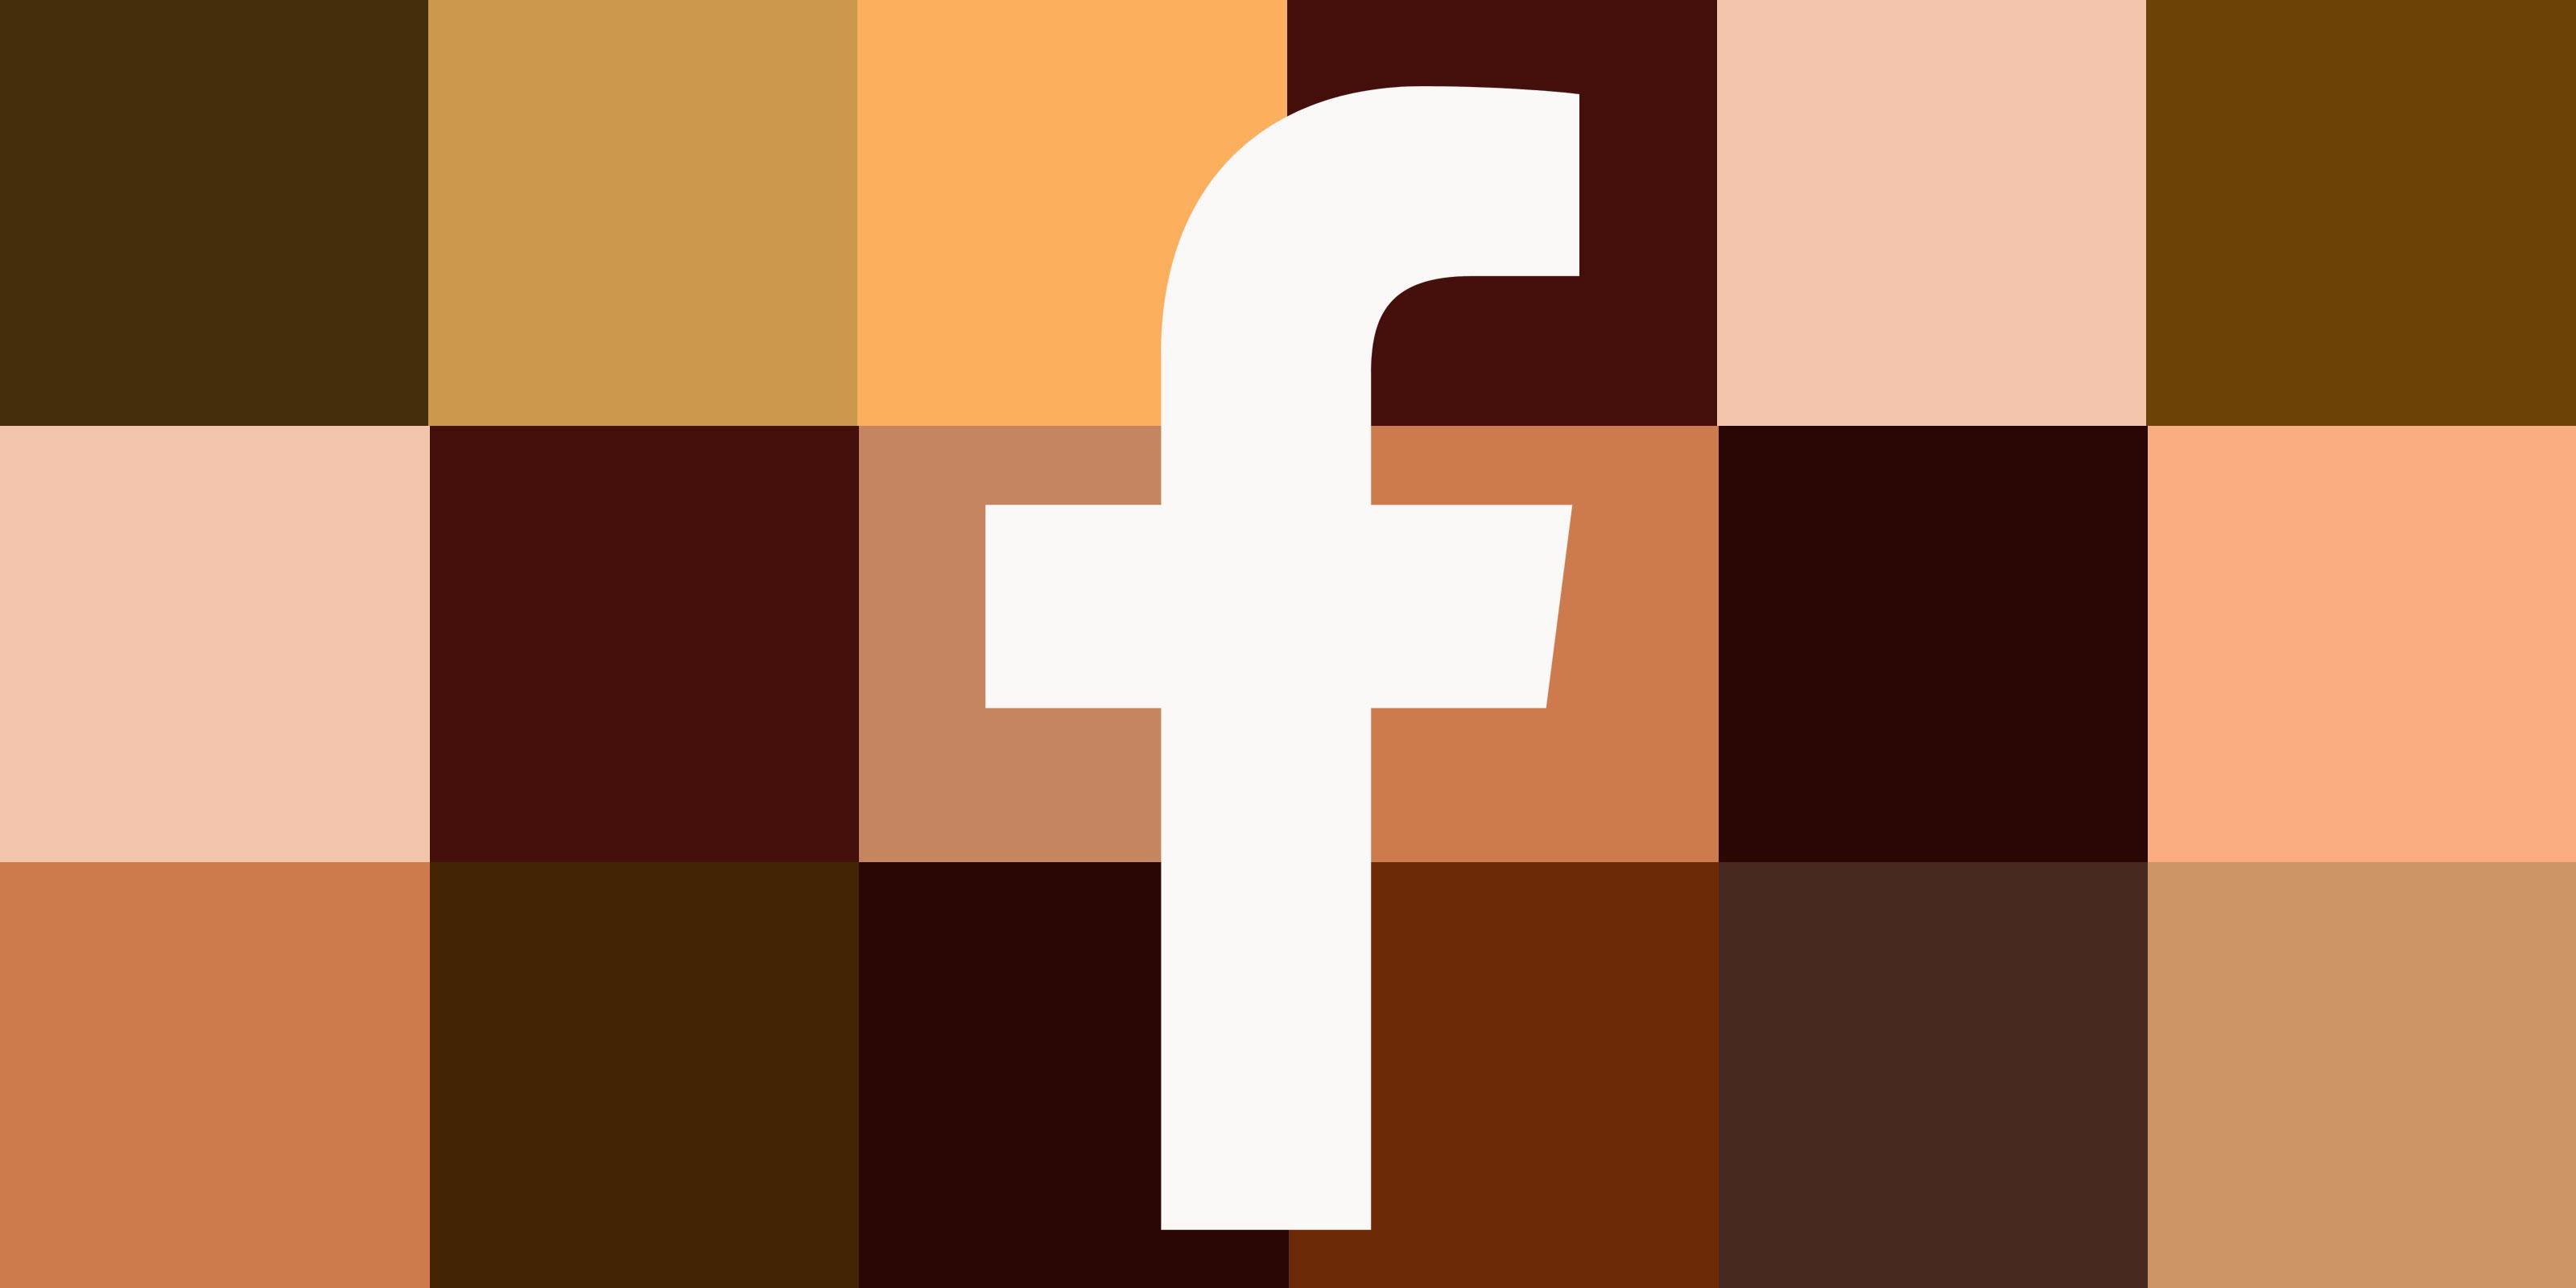 Facebook's ad-serving algorithm discriminates by gender and race